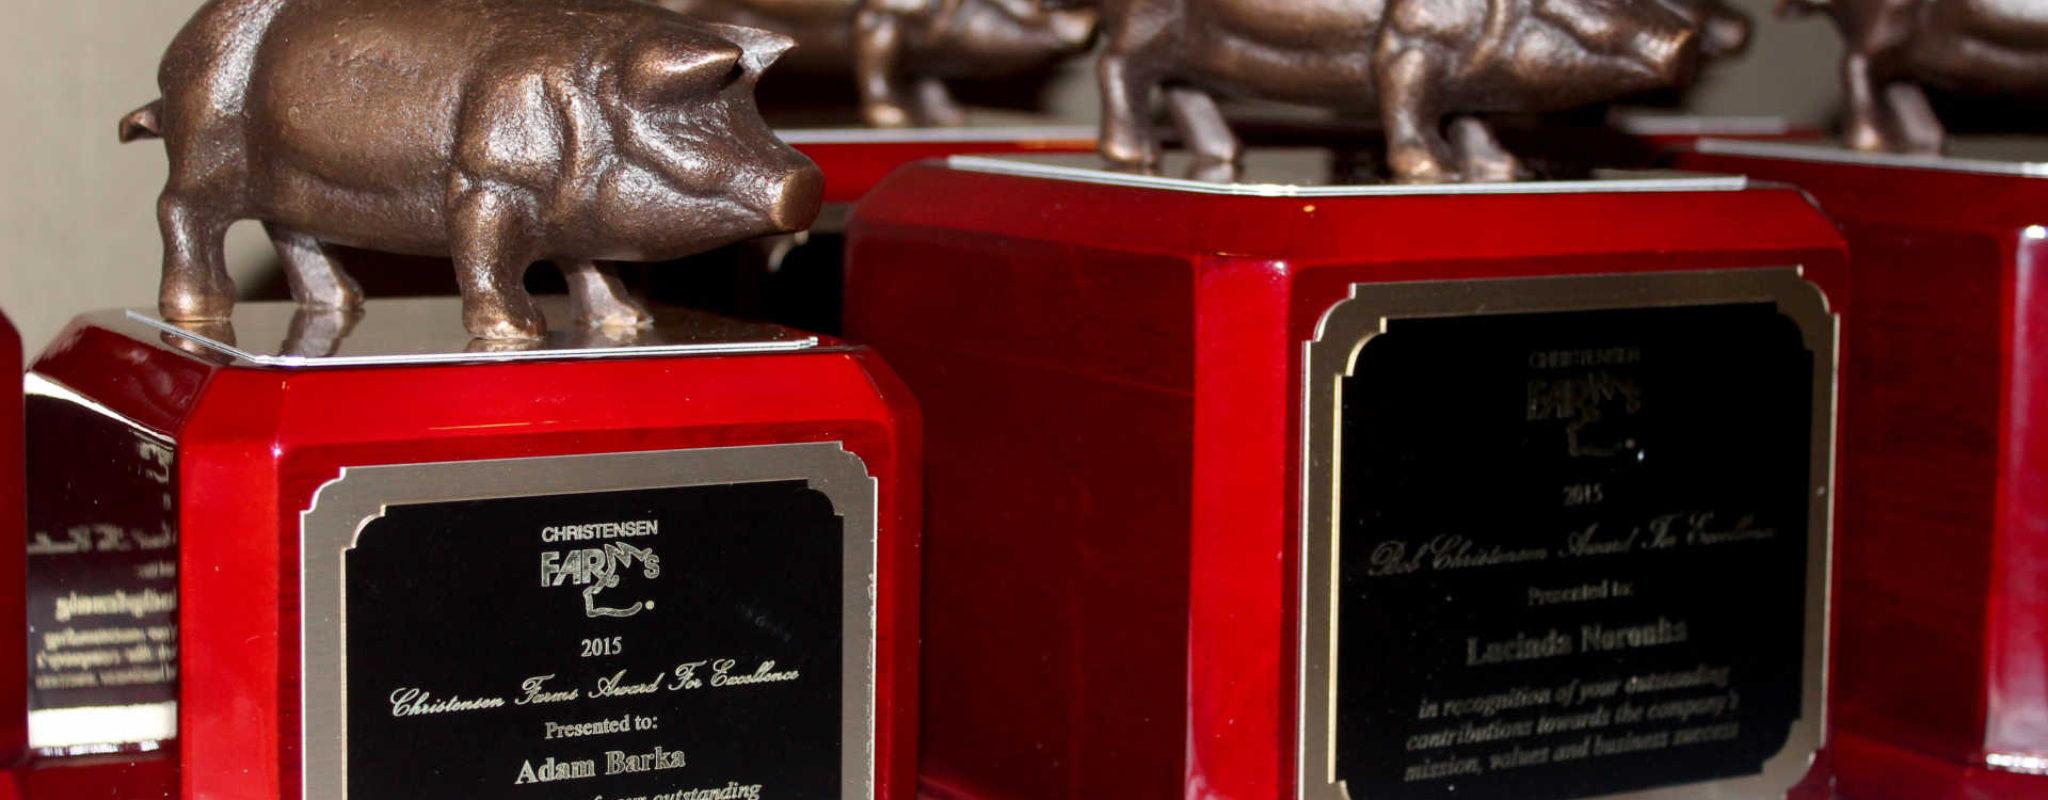 Christensen Farms Hosts Its 3rd Annual Organizational Awards Event